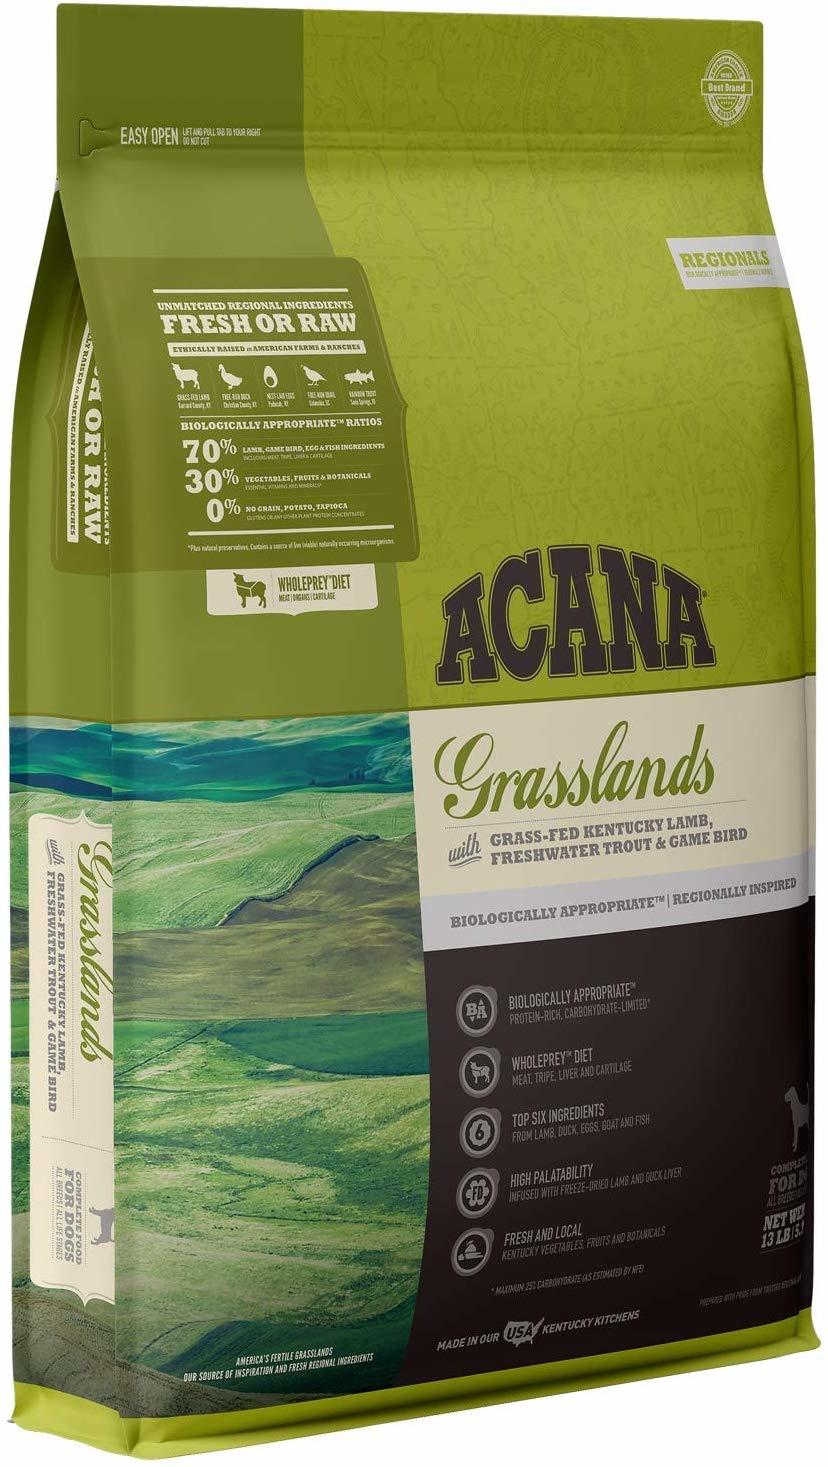 Acana (Champion) Acana Grasslands 13 lb